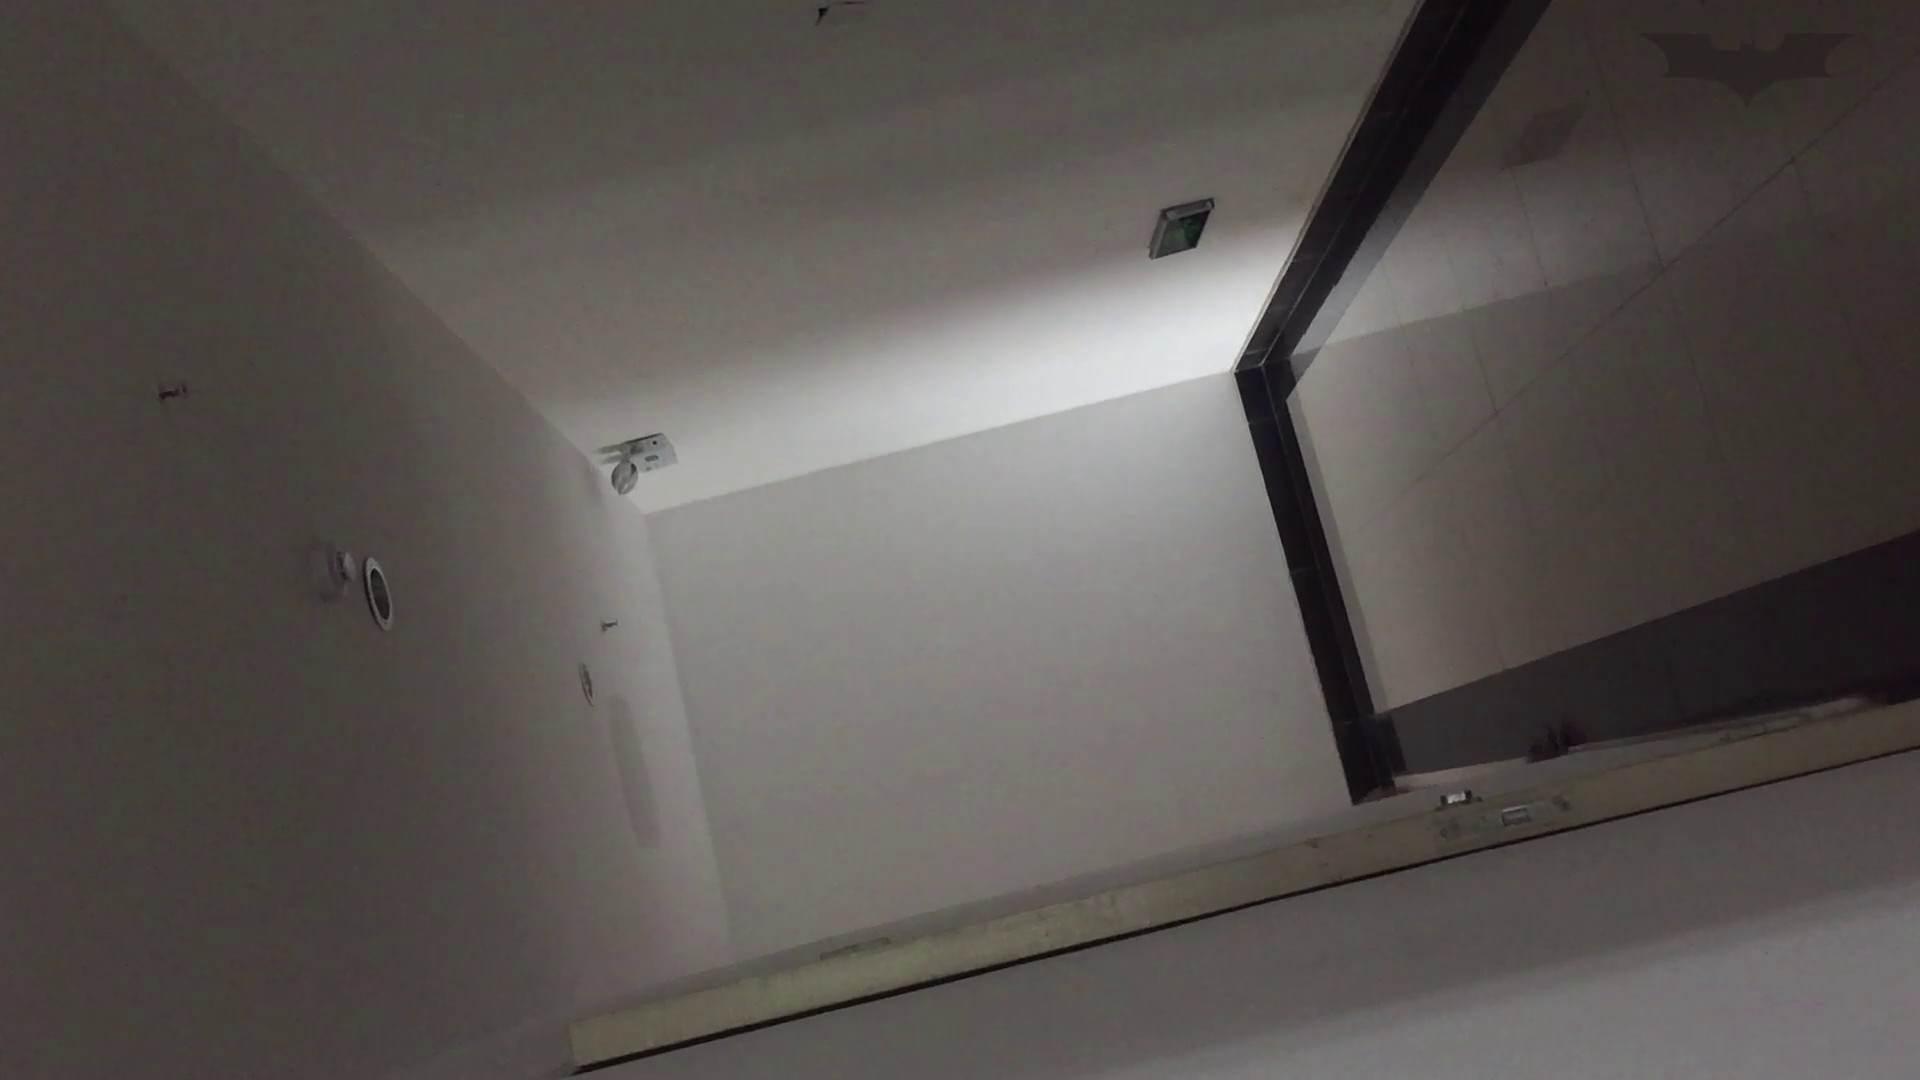 JD盗撮 美女の洗面所の秘密 Vol.74 洗面所シーン オメコ動画キャプチャ 109画像 17